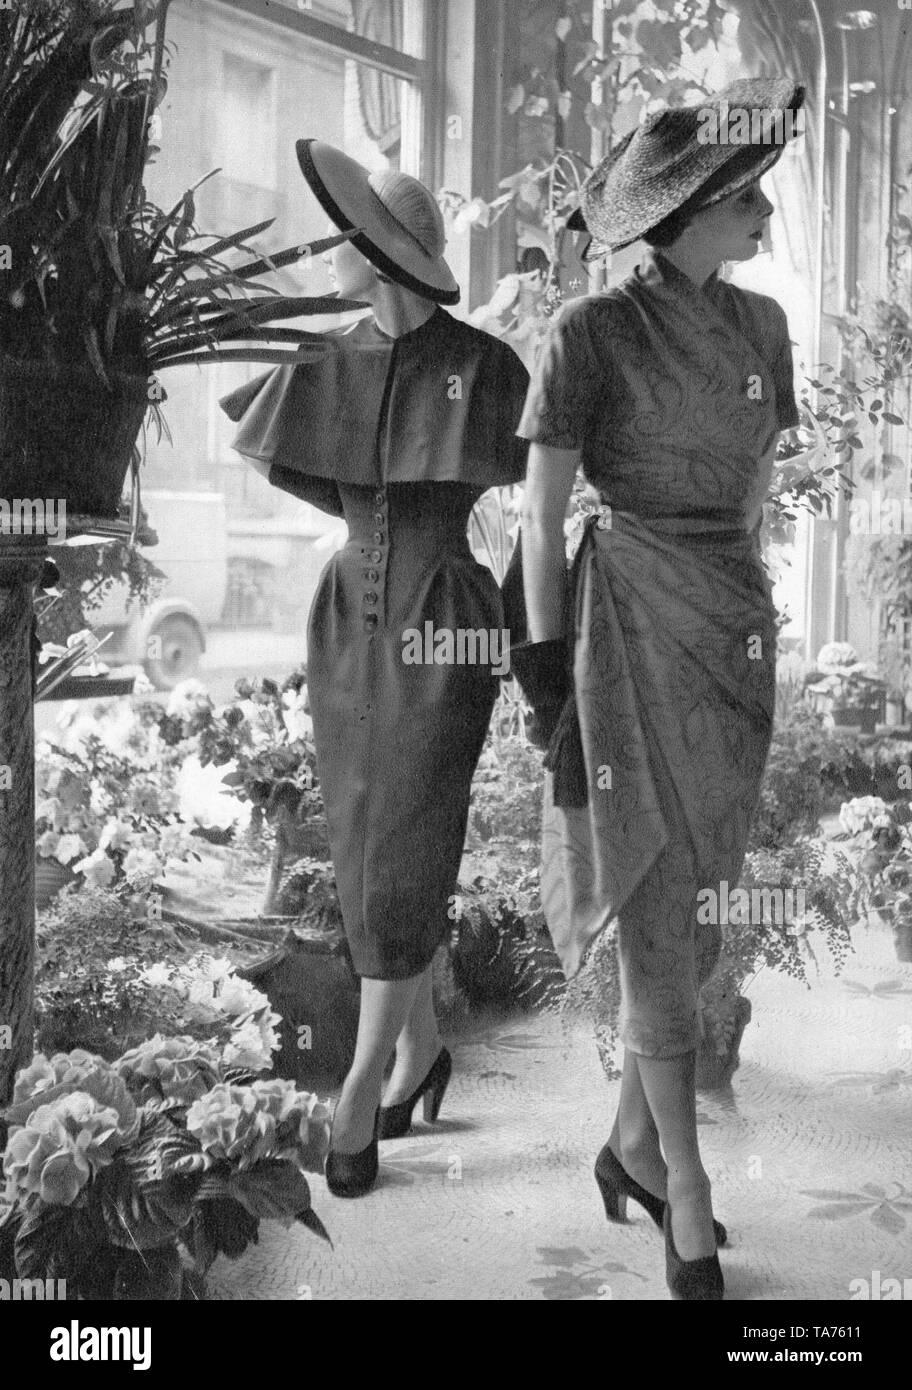 French Fashion Models 1950s - Stock Image